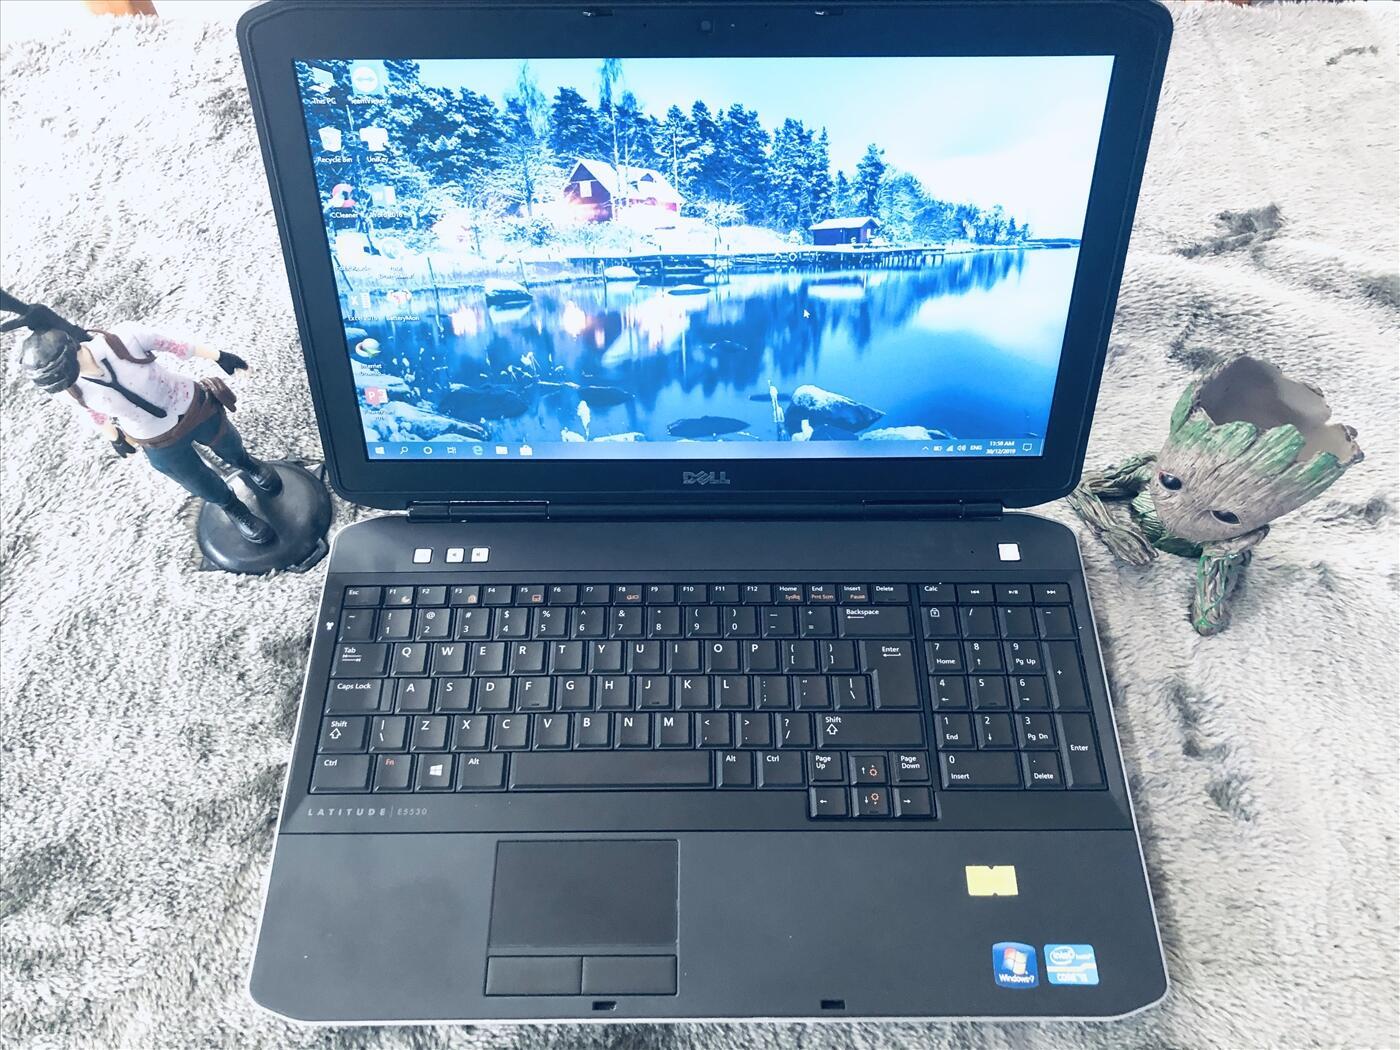 Dell Latitude E5530 || i5-3210M~2.5GHz || RAM 4G/HDD 500G || 15.6